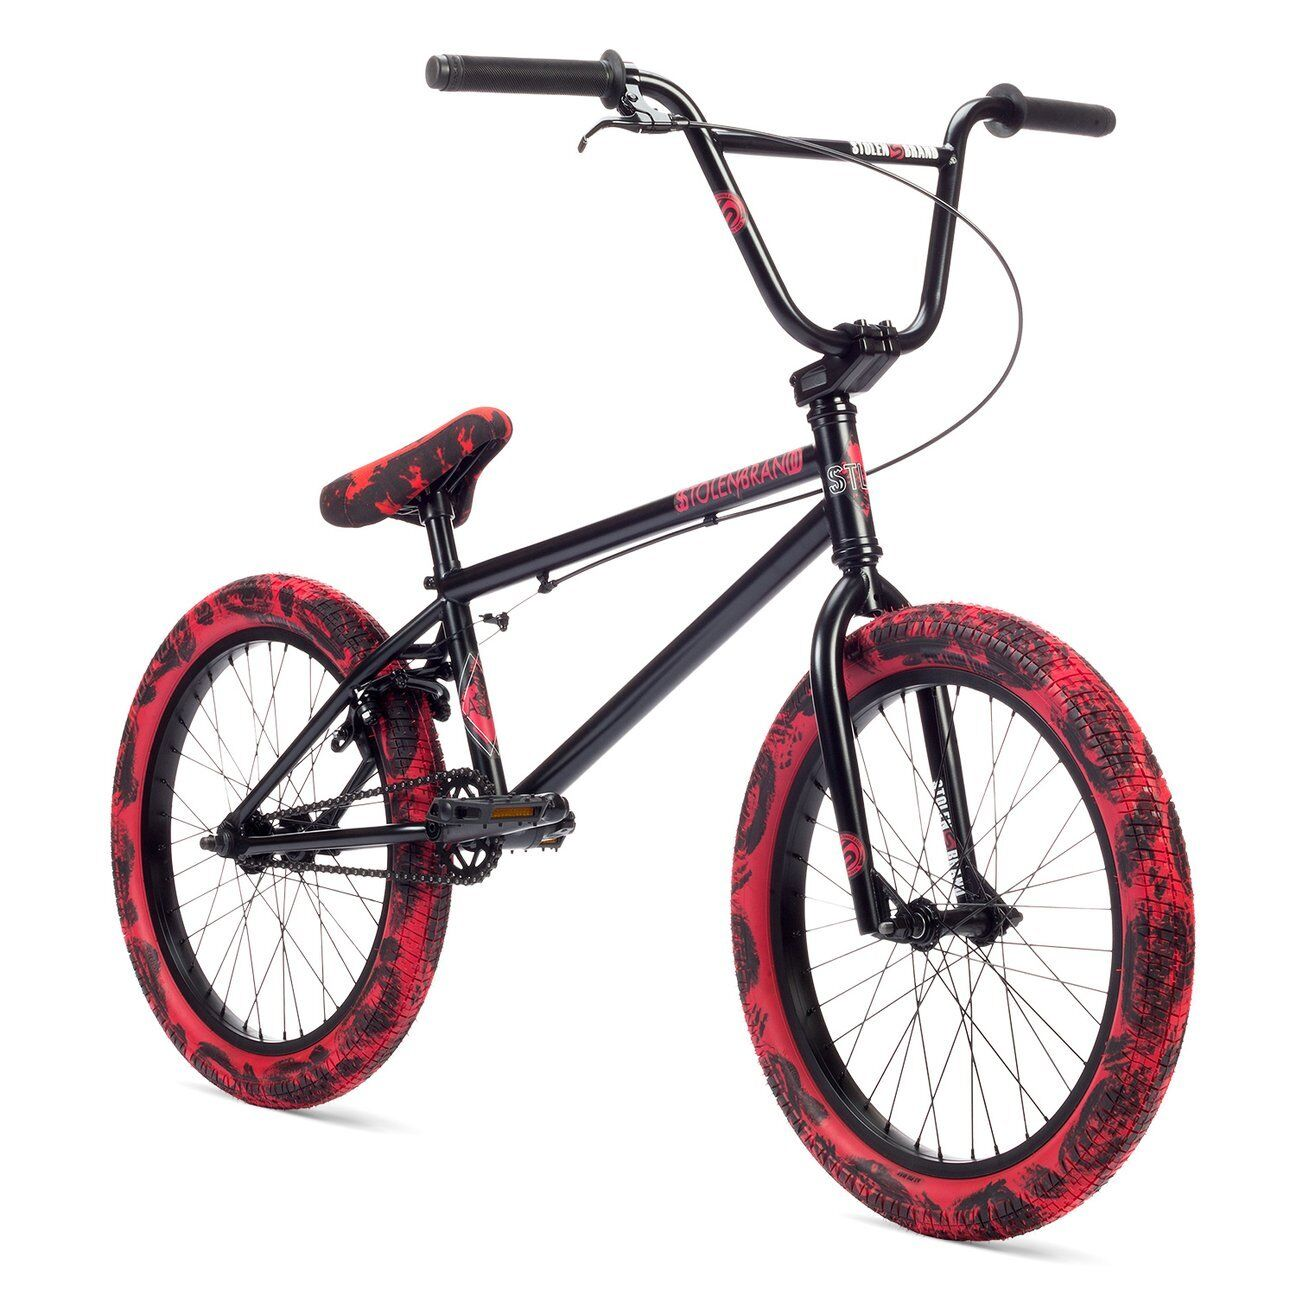 "Stolen Casino XL 20"" BMX Bike Black & Red Tie Dye Complete BMX Bicycle"